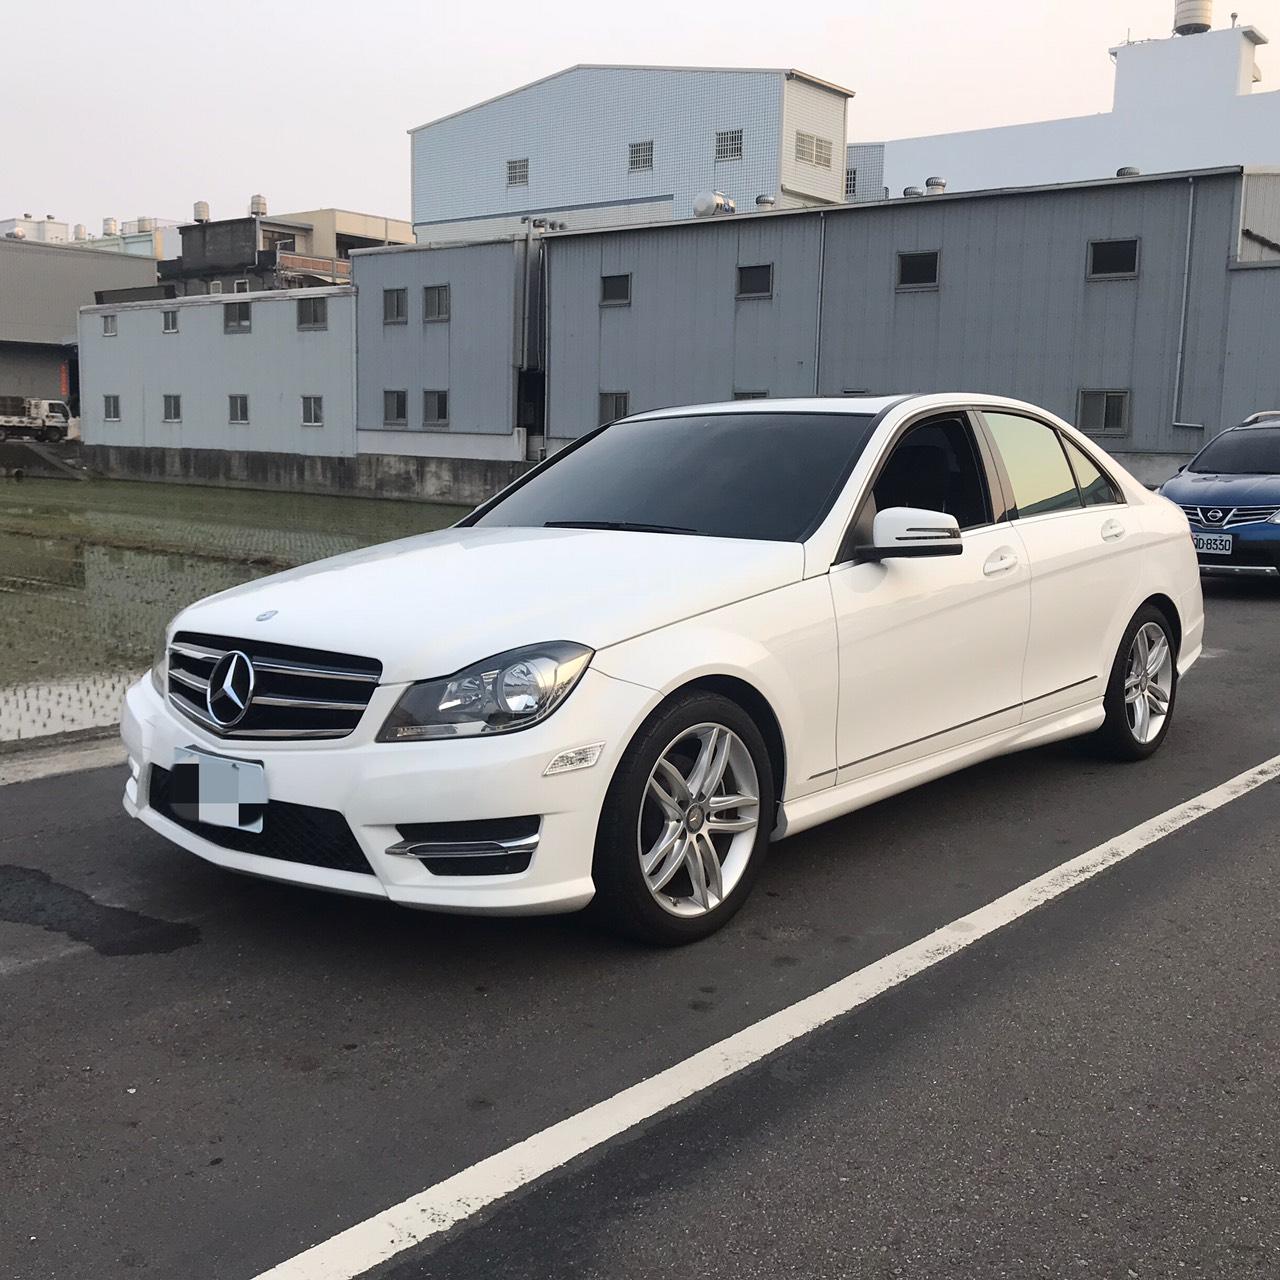 2014 M-benz C-class